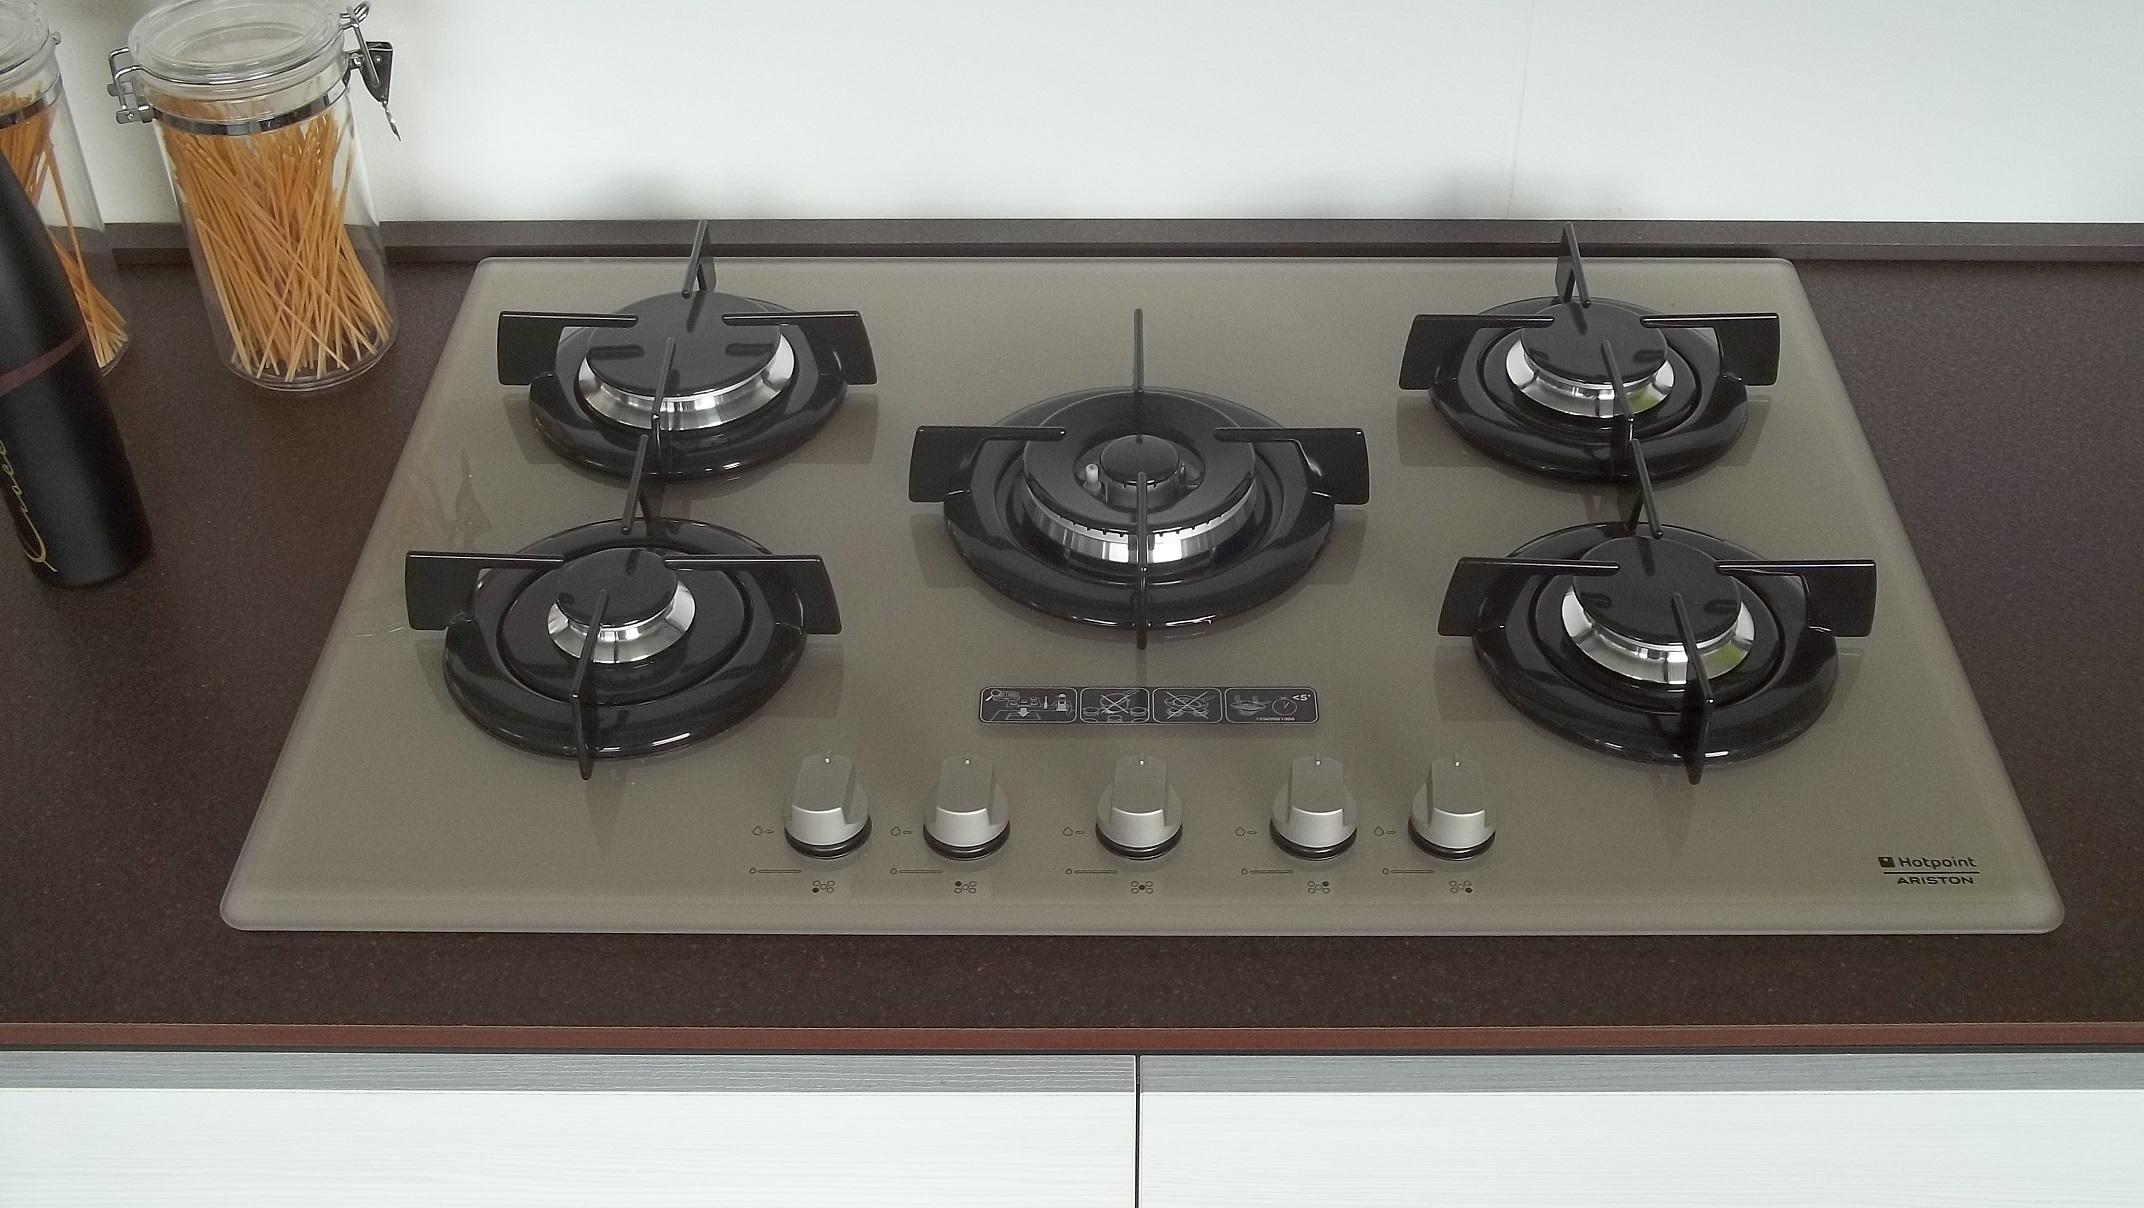 Cucina spar life madrid moderna laminato opaco larice for Piano cottura cucina